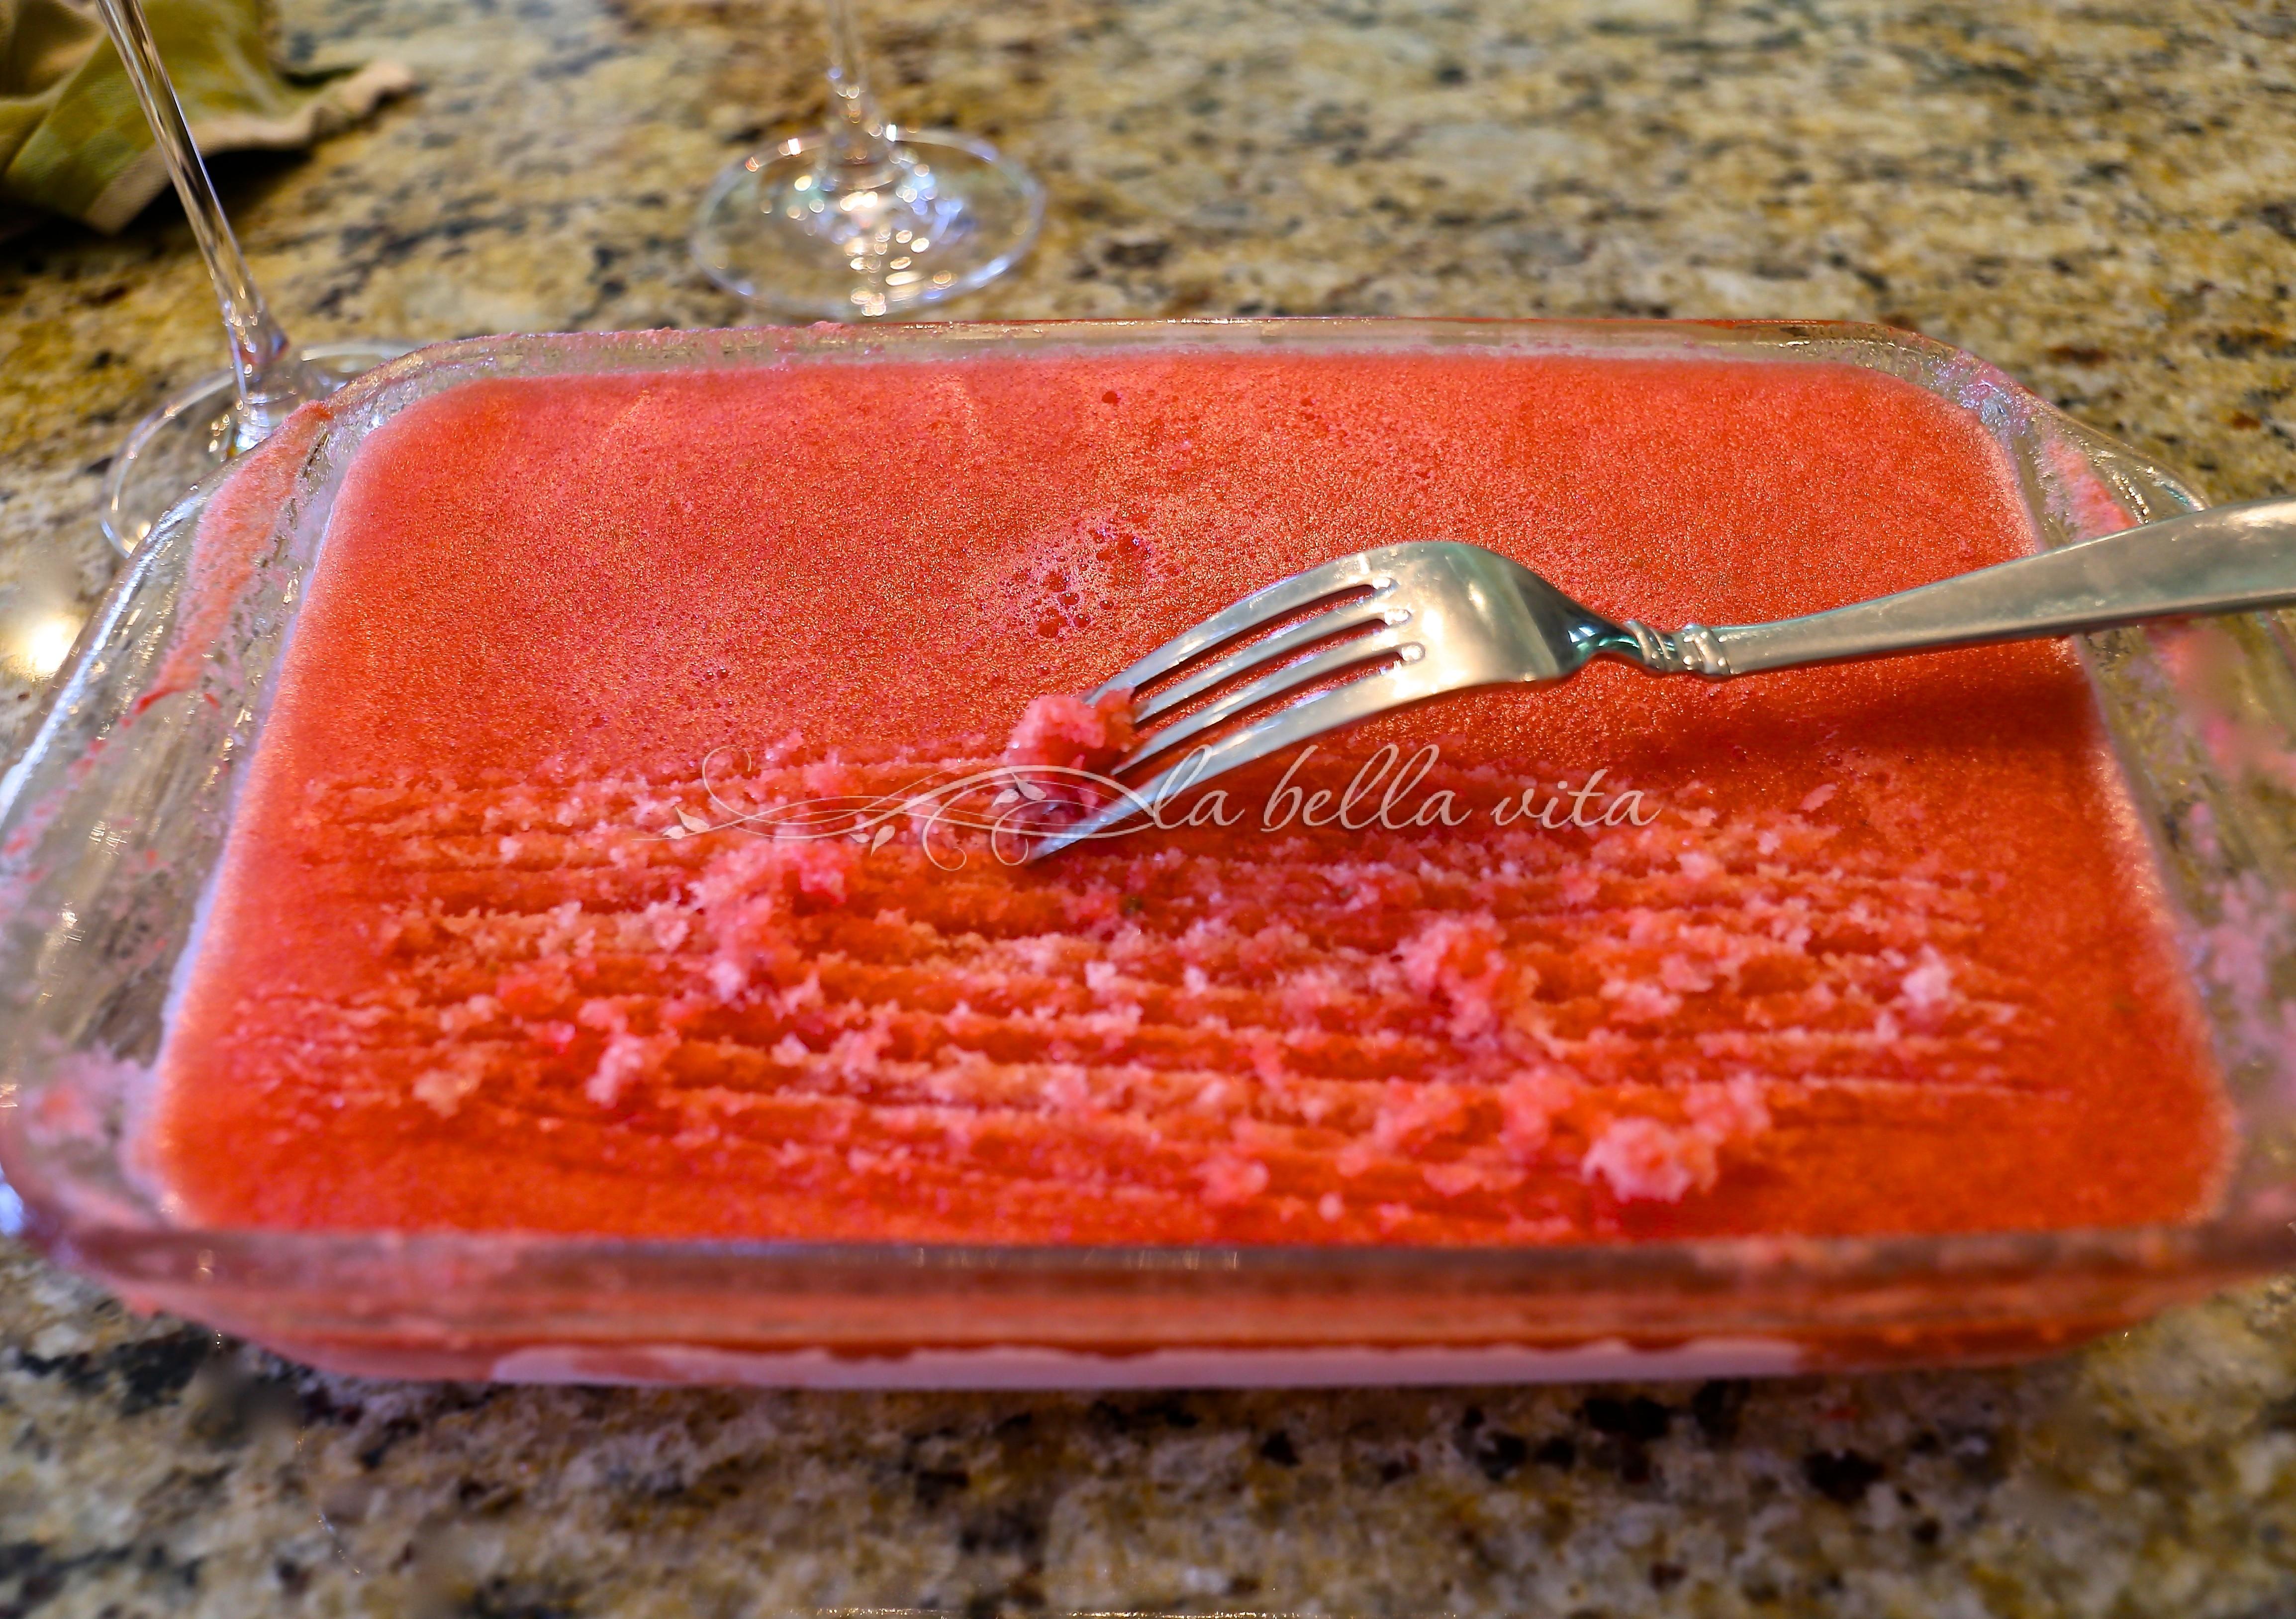 Watermelon Granita Italian Ice An Authentic Recipe From Amalfi